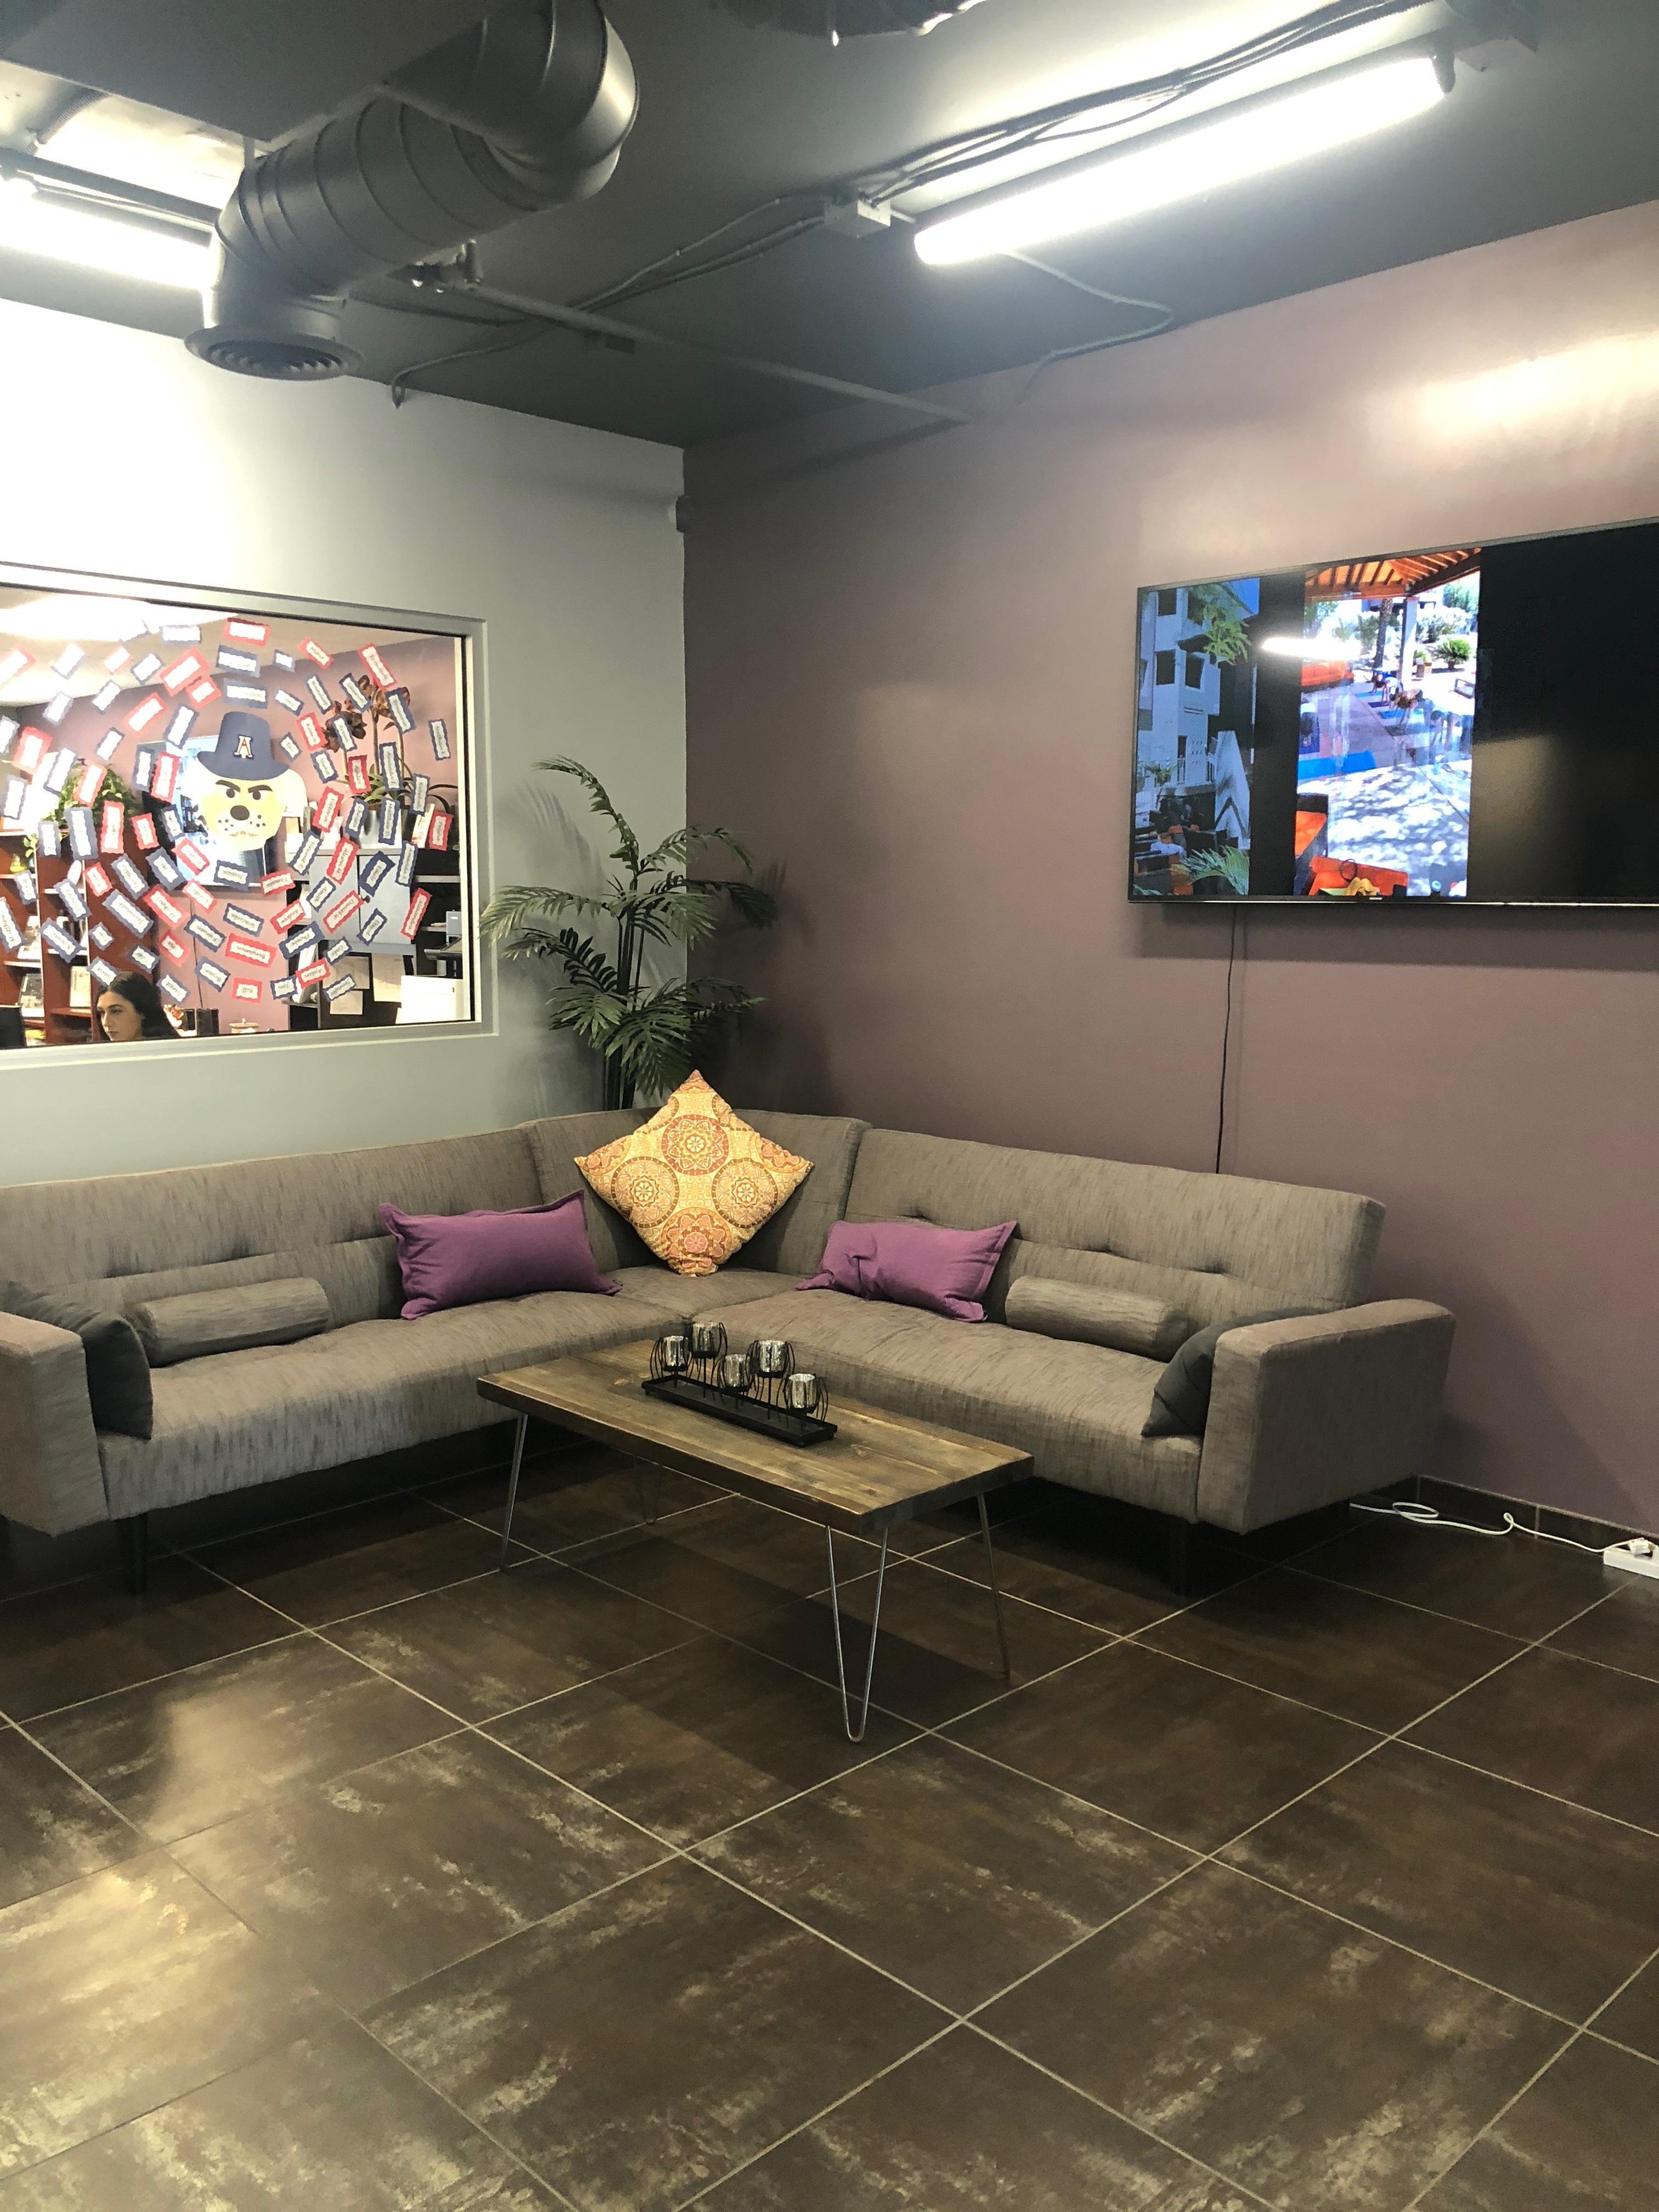 The-Stone-Avenue-Standard-Tucson-AZ-Living-Area-Unilodgers